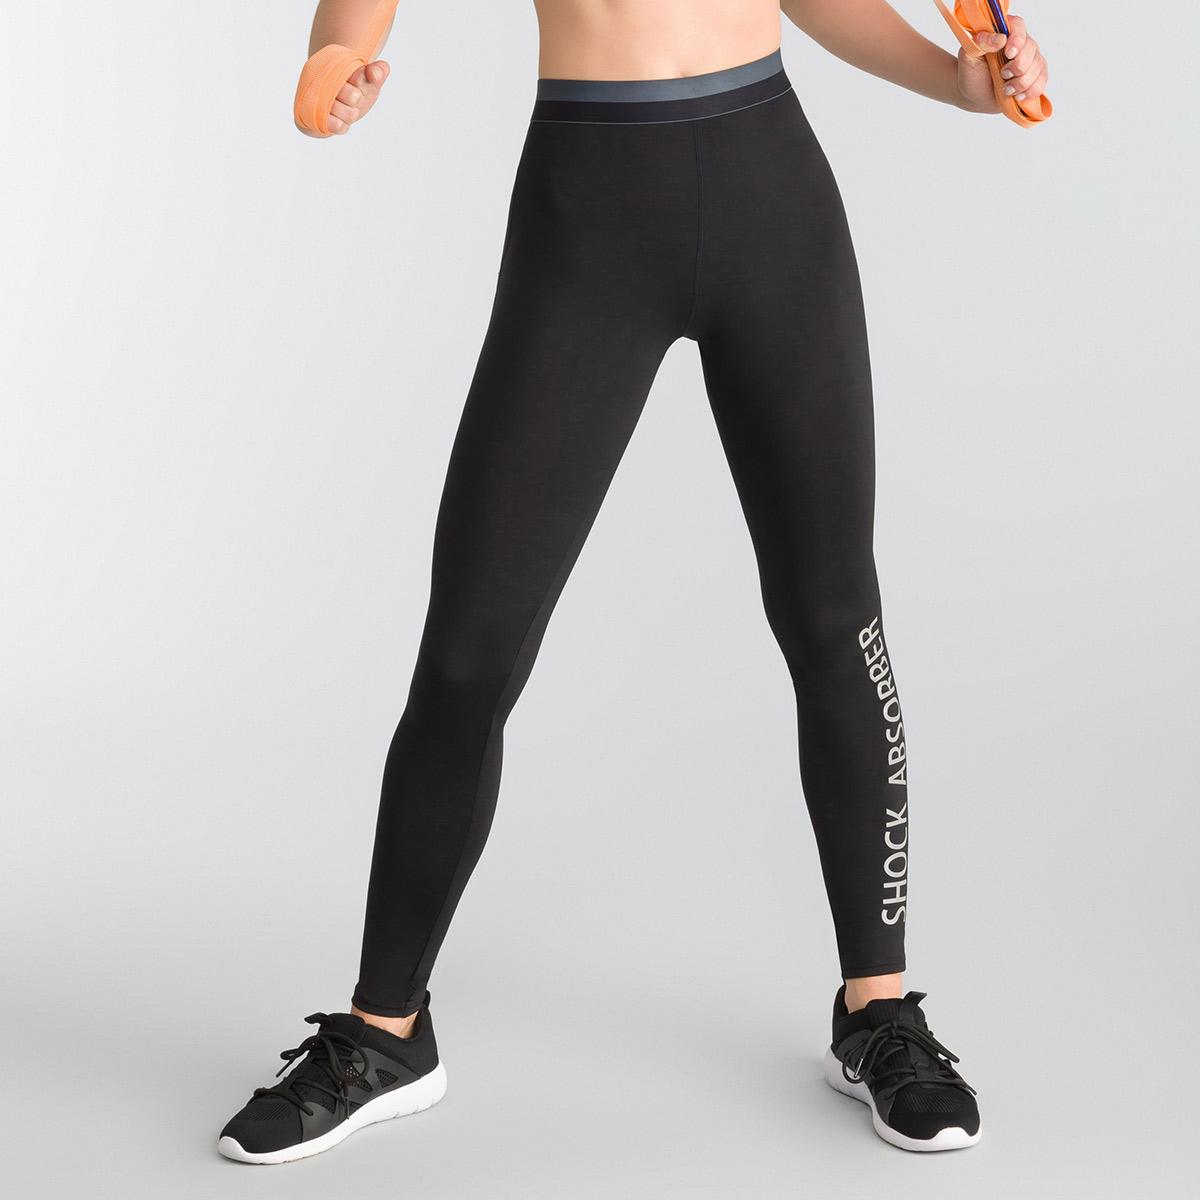 Active Wear leggings in black Shock Absorber, , DIM